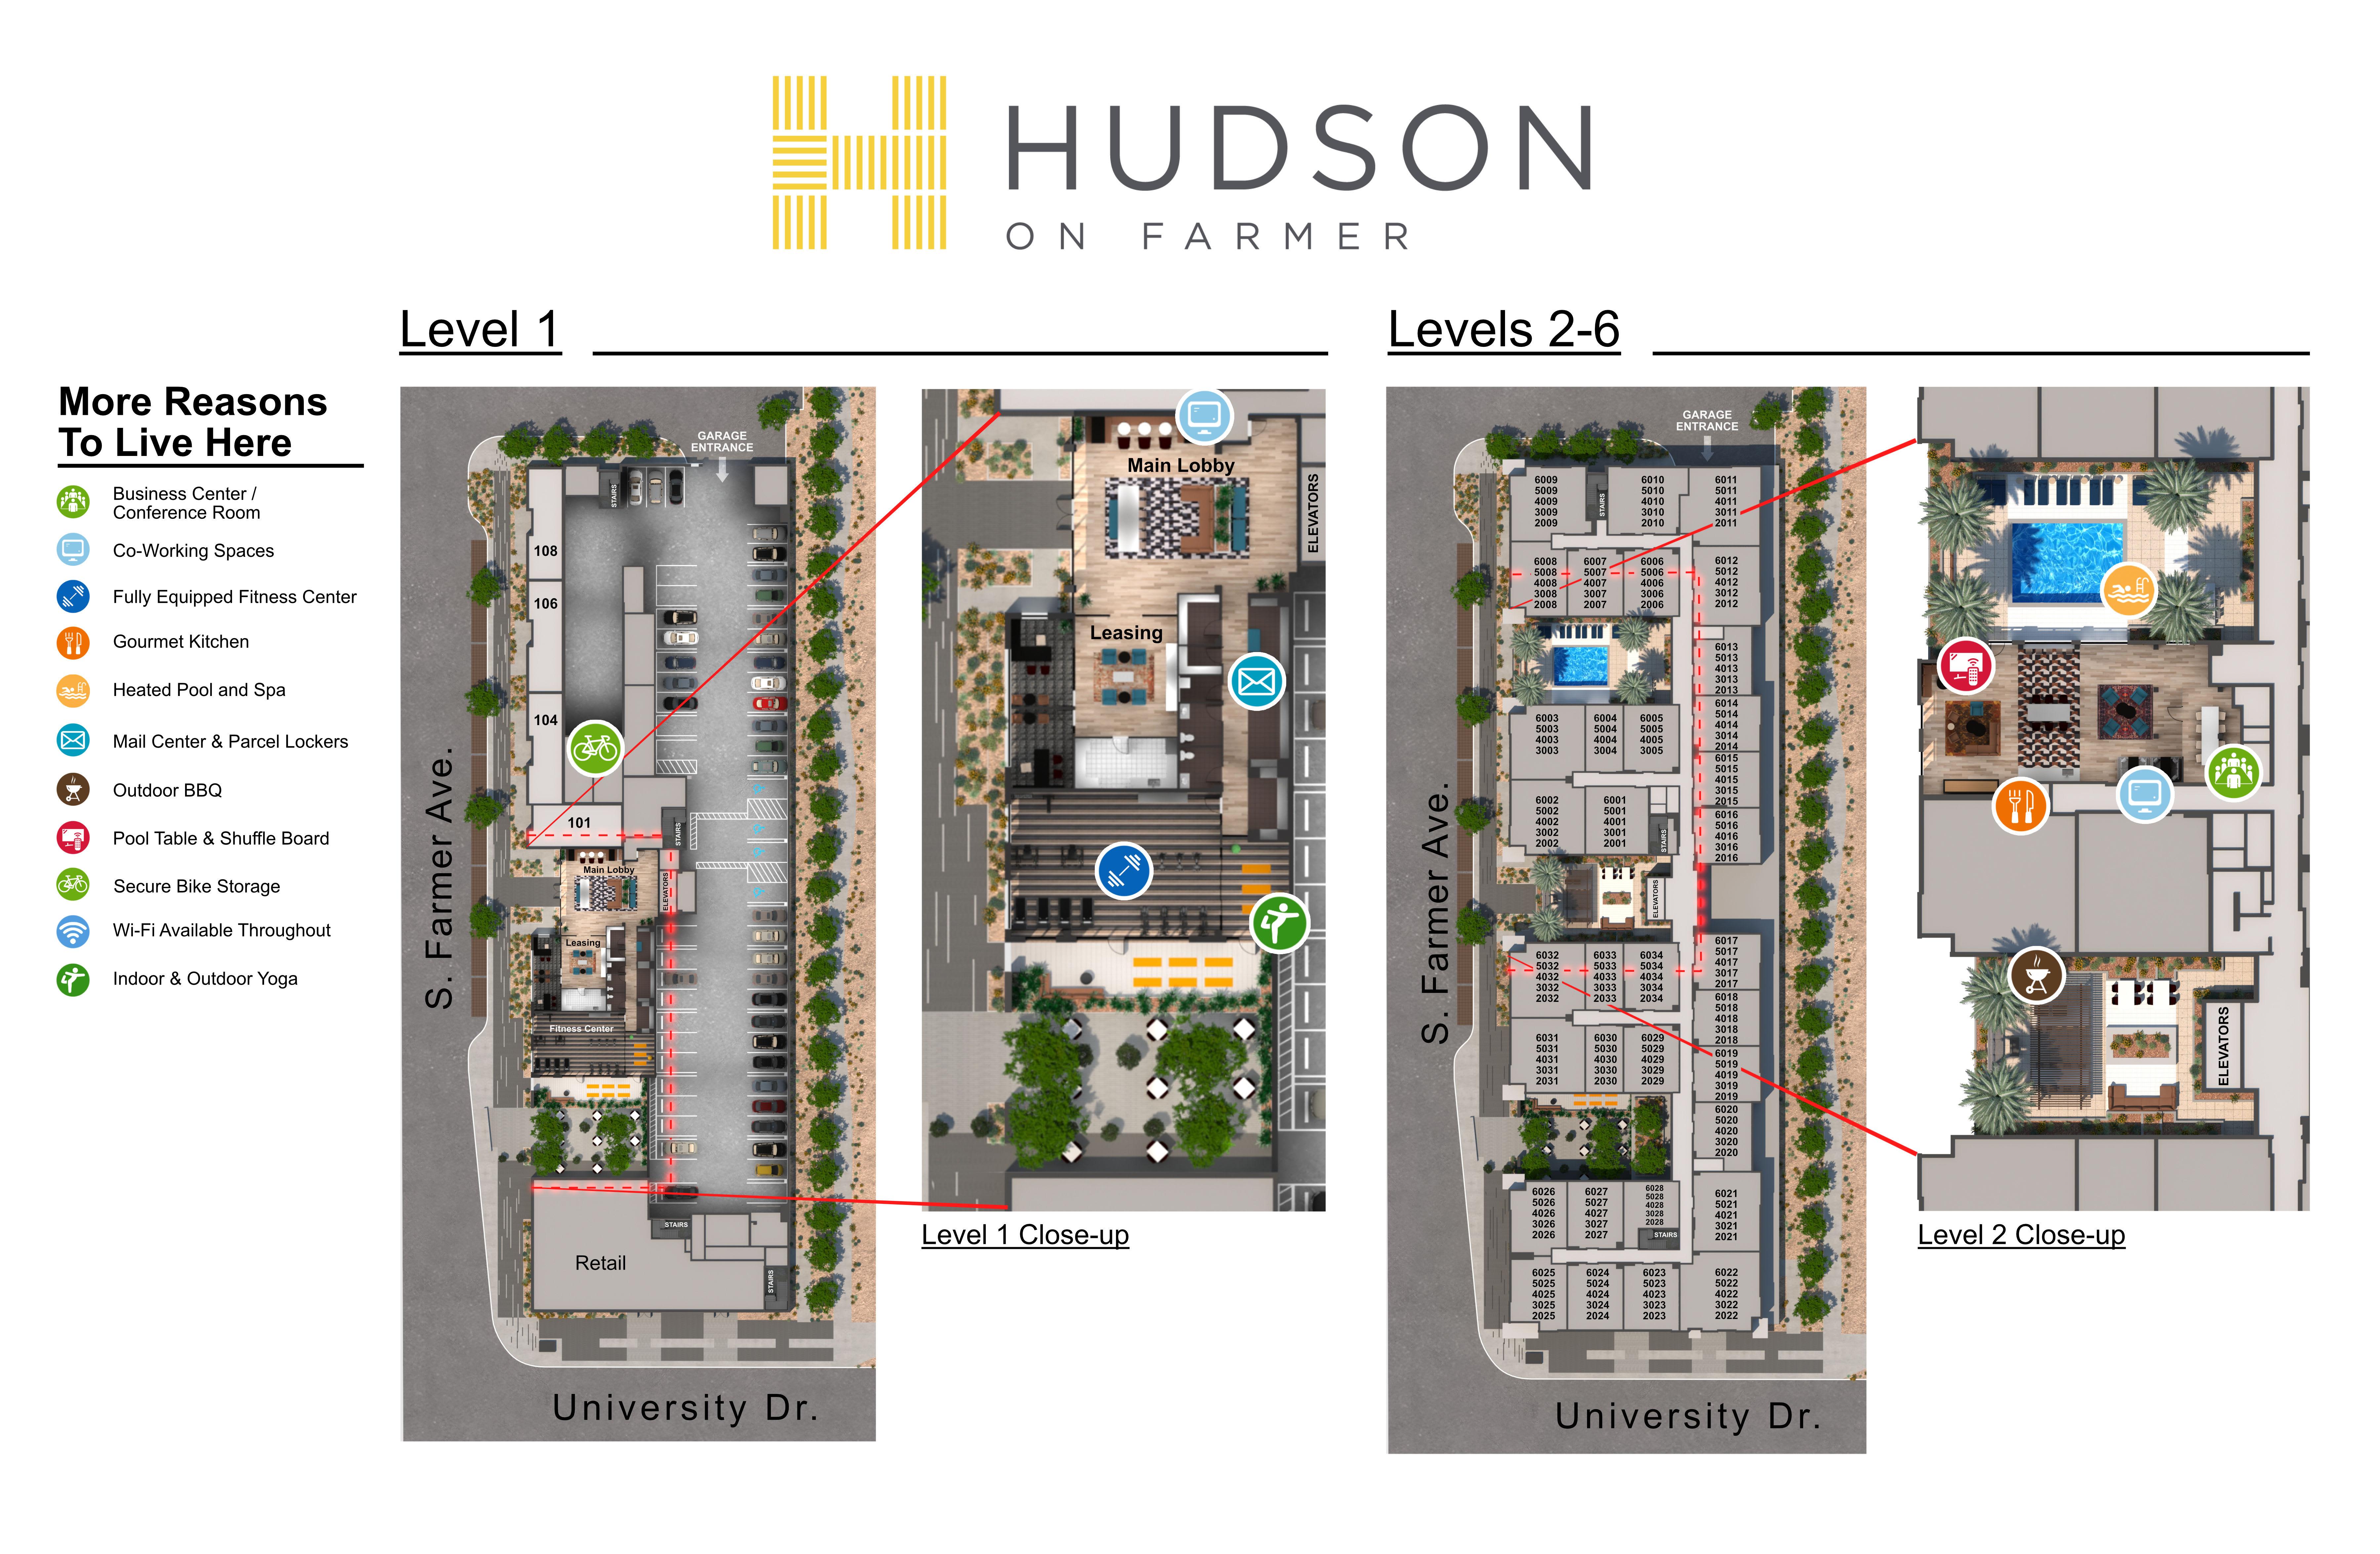 Hudson on Farmer site plan